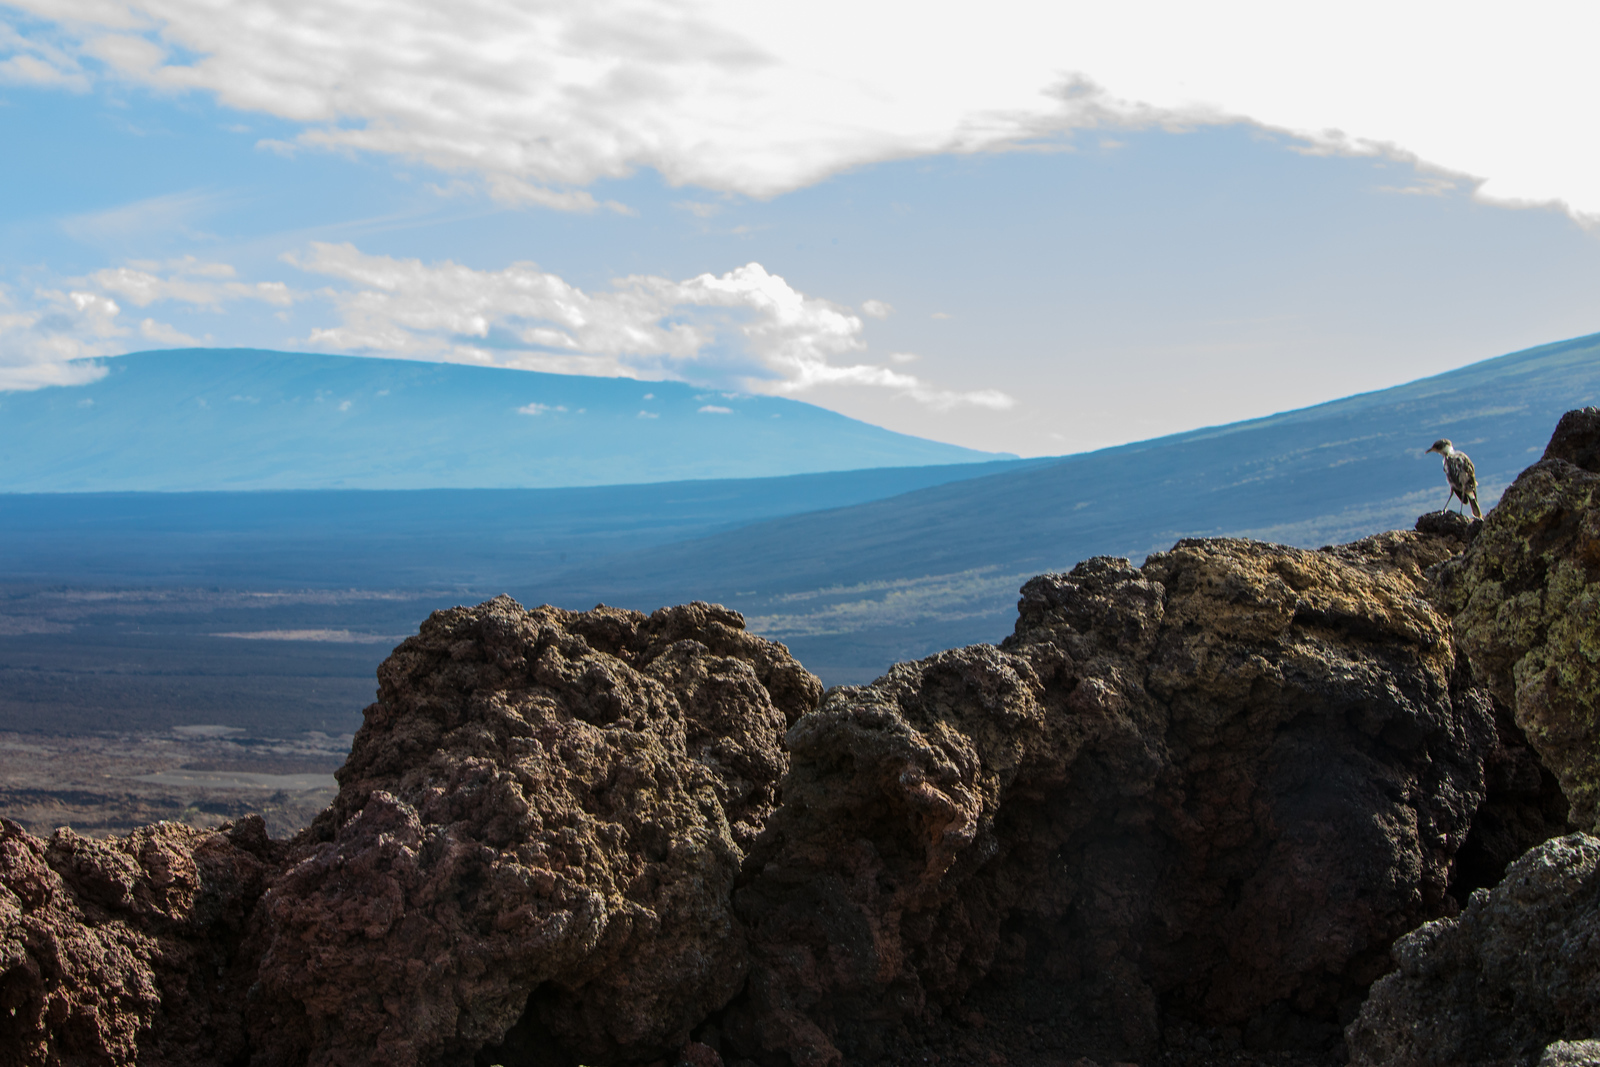 Galapagos Mocking Bird Surveys the View